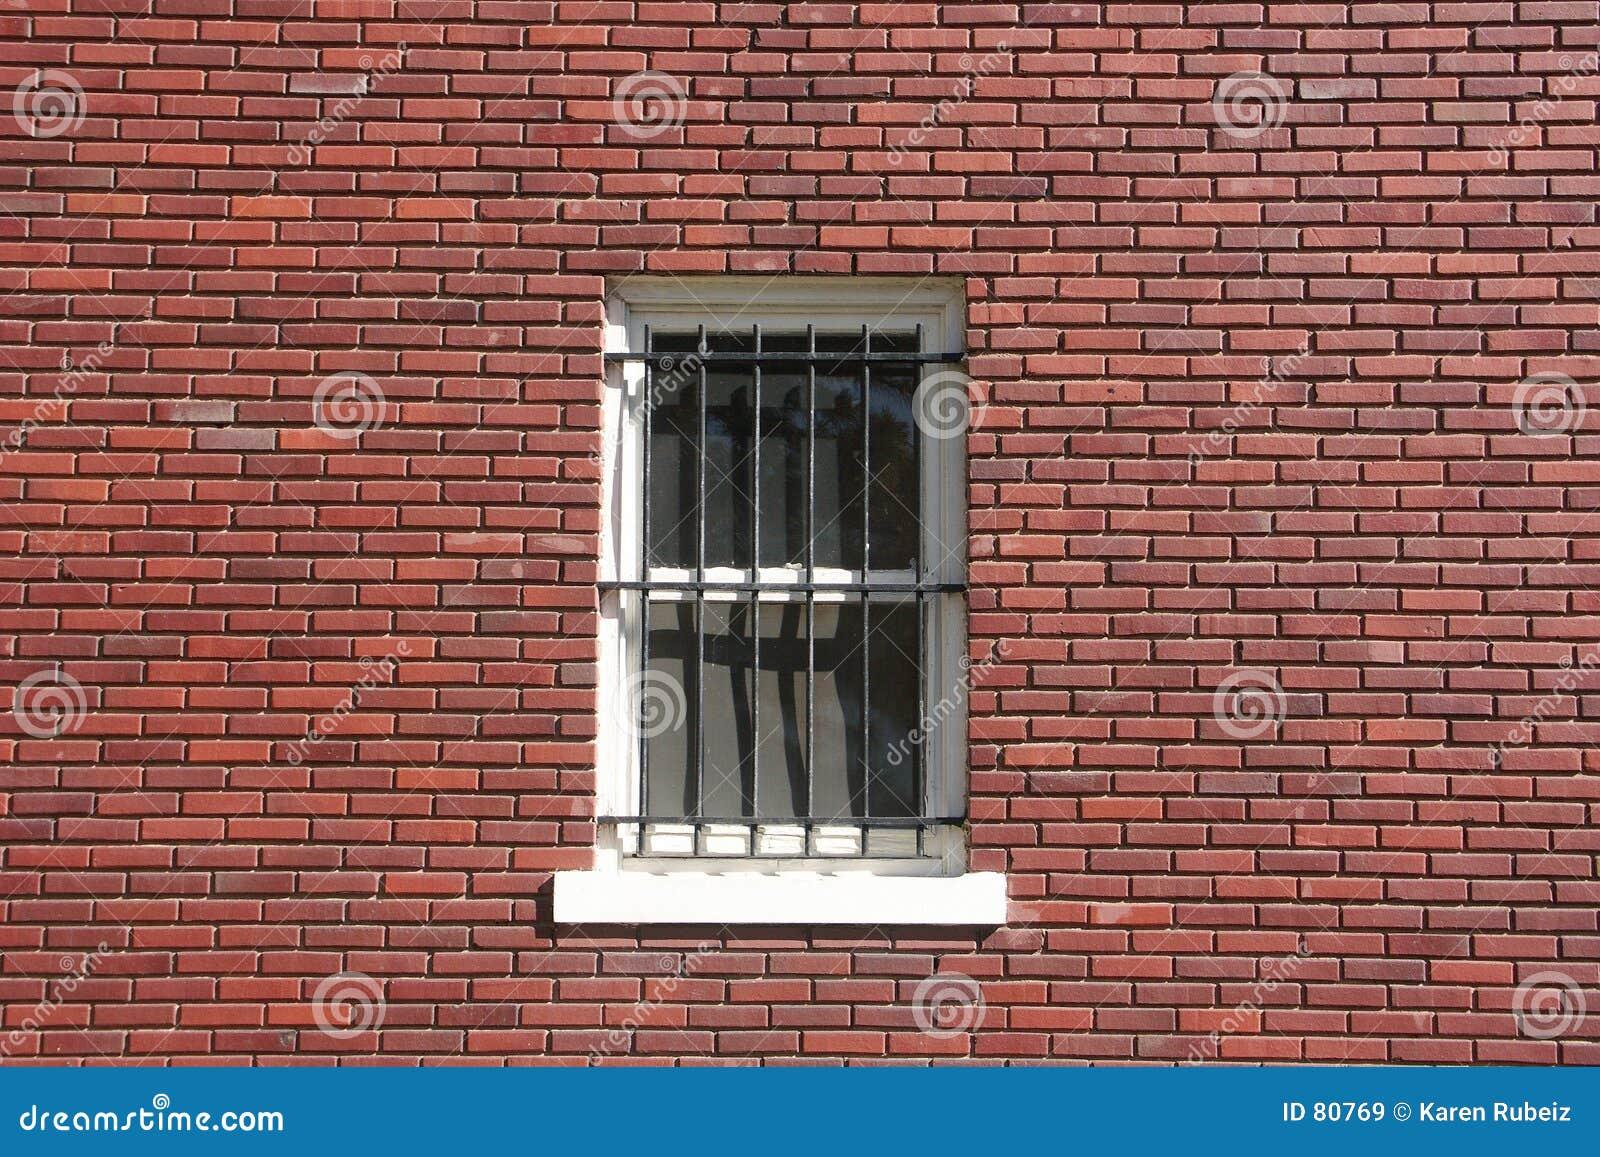 Brick Wall, Window And Bars Stock Image - Image: 80769